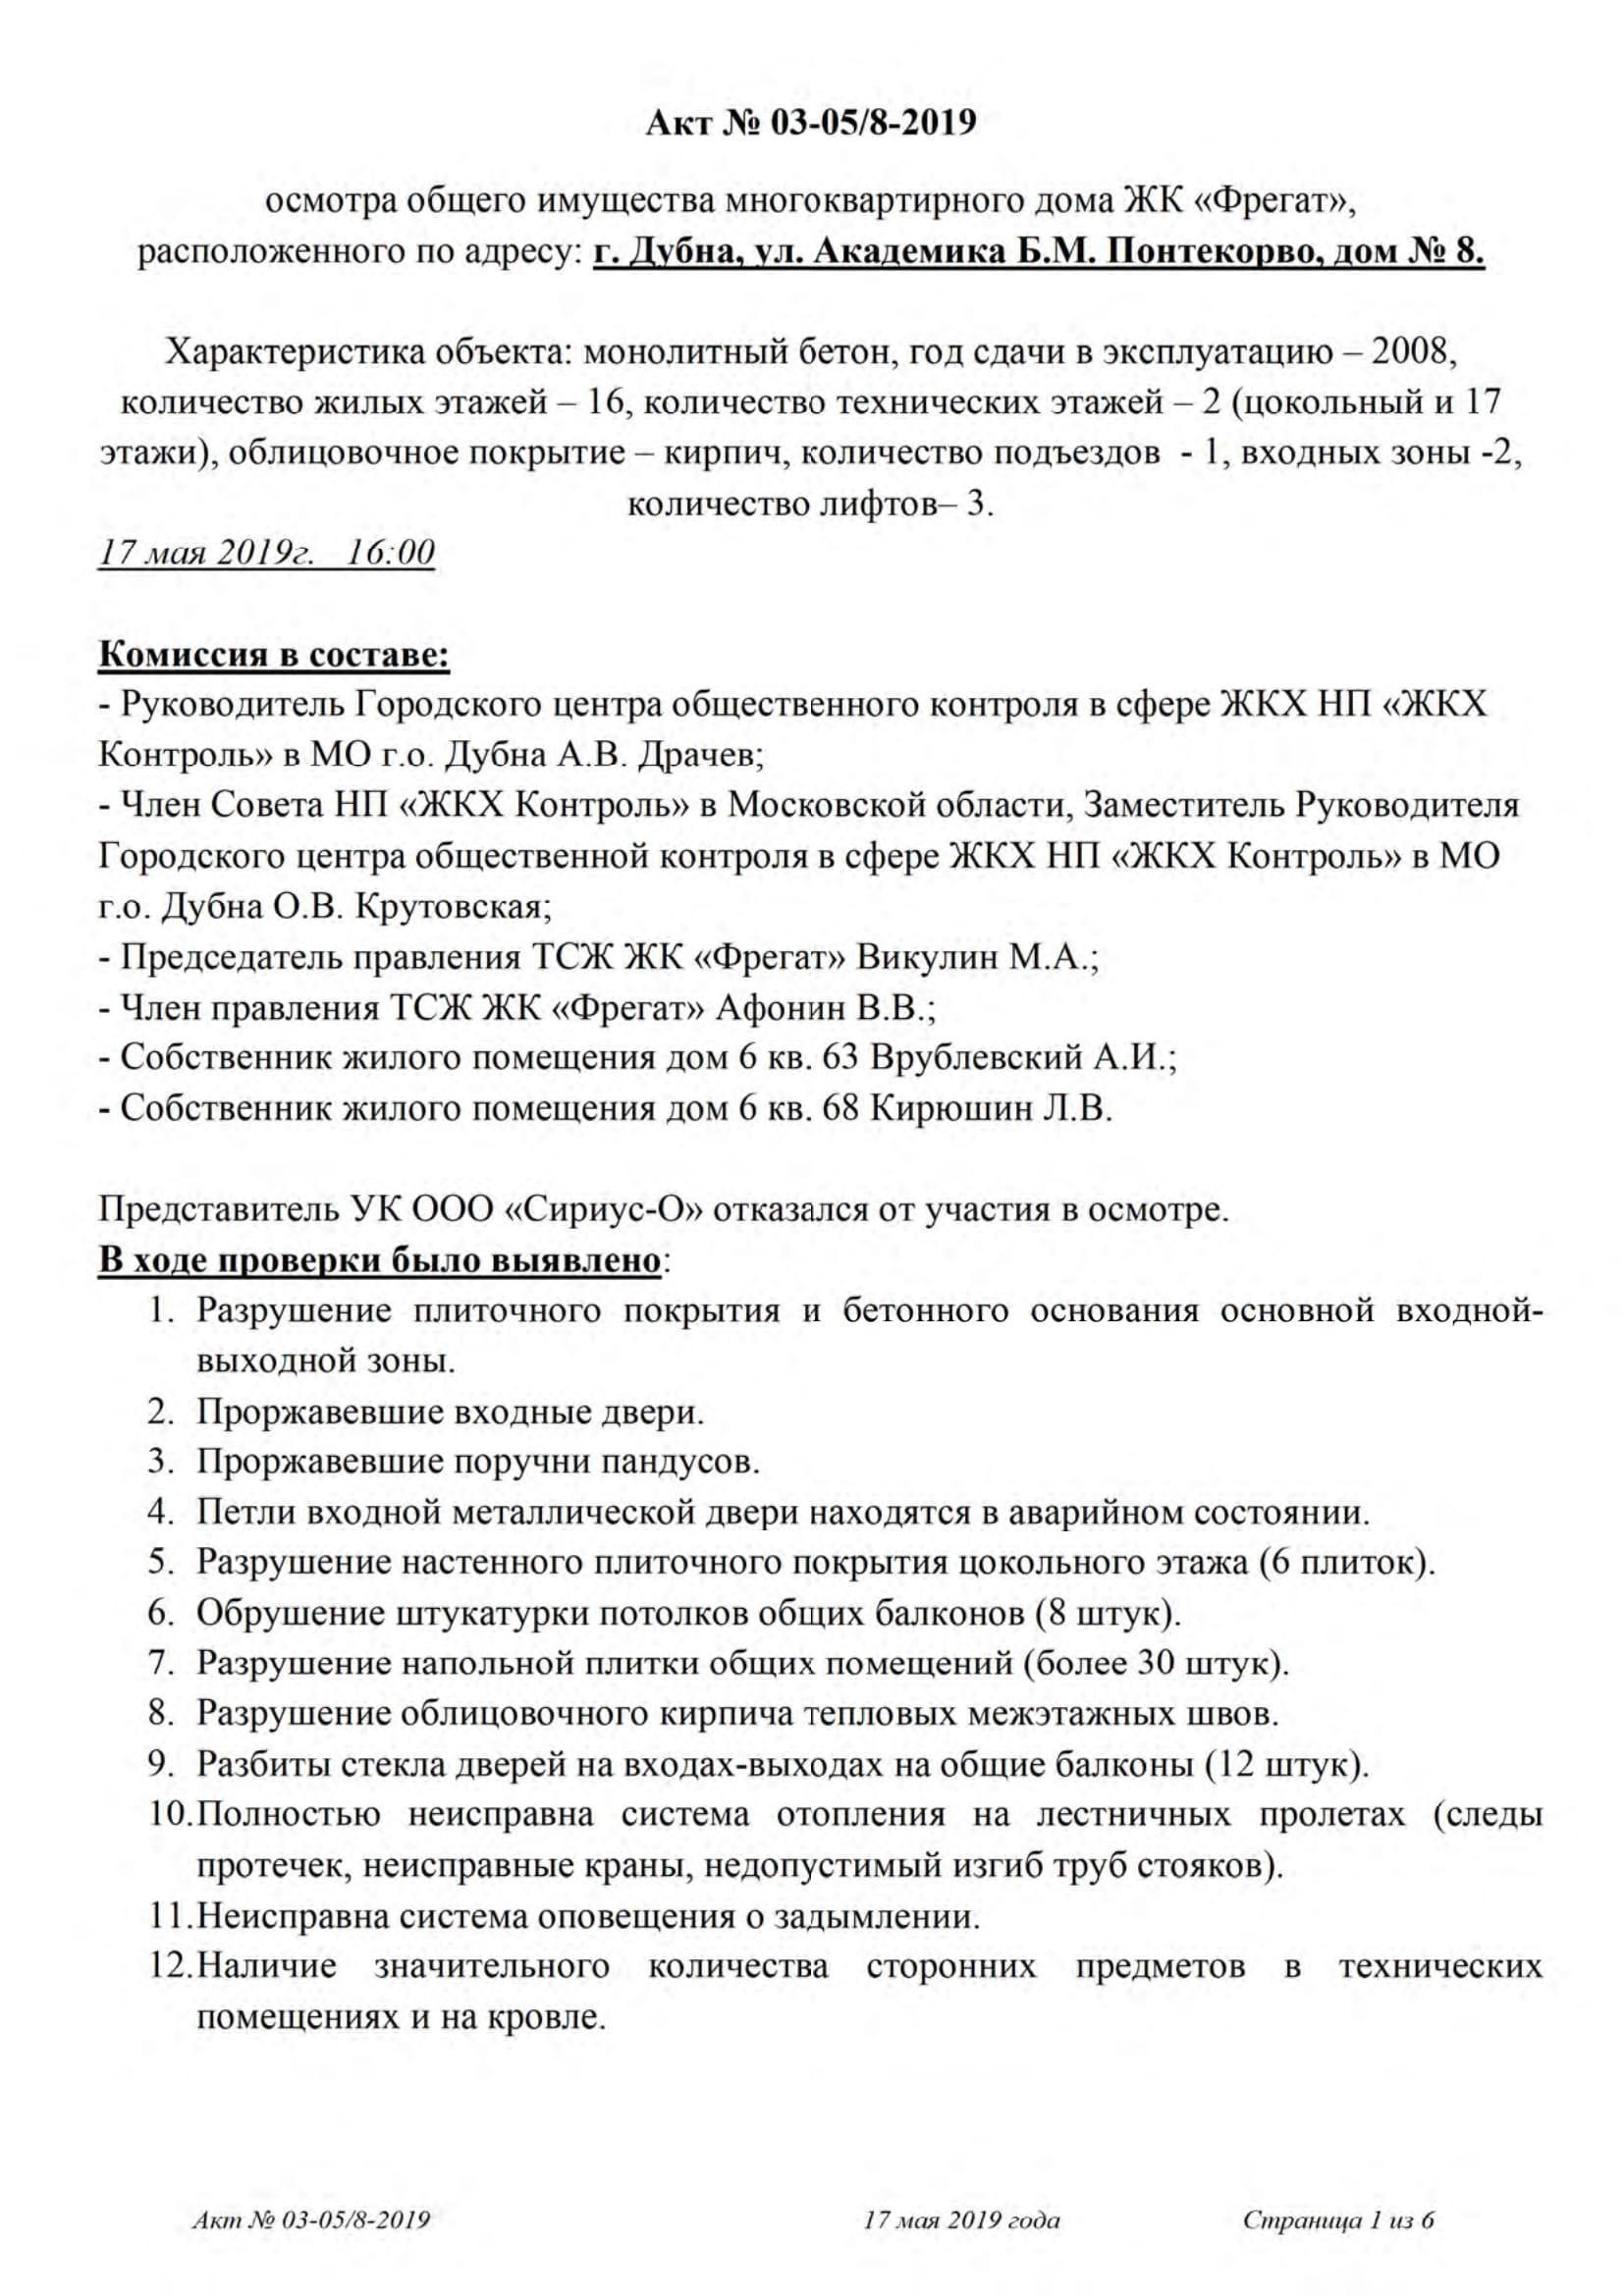 ЖКХ-Контроль-АКТ-Фрегат8-3_sign_imgS-1